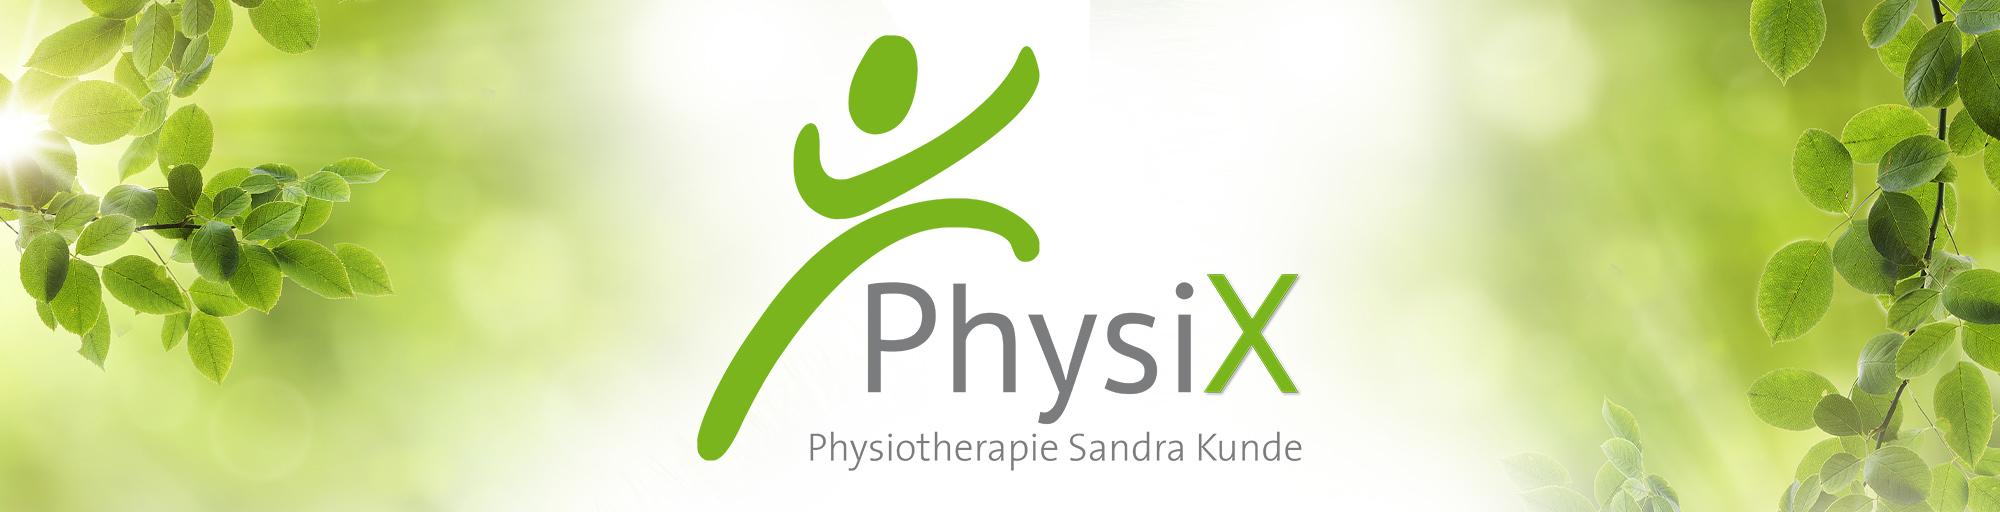 PhysiX Physiotherapie – Sandra Kunde